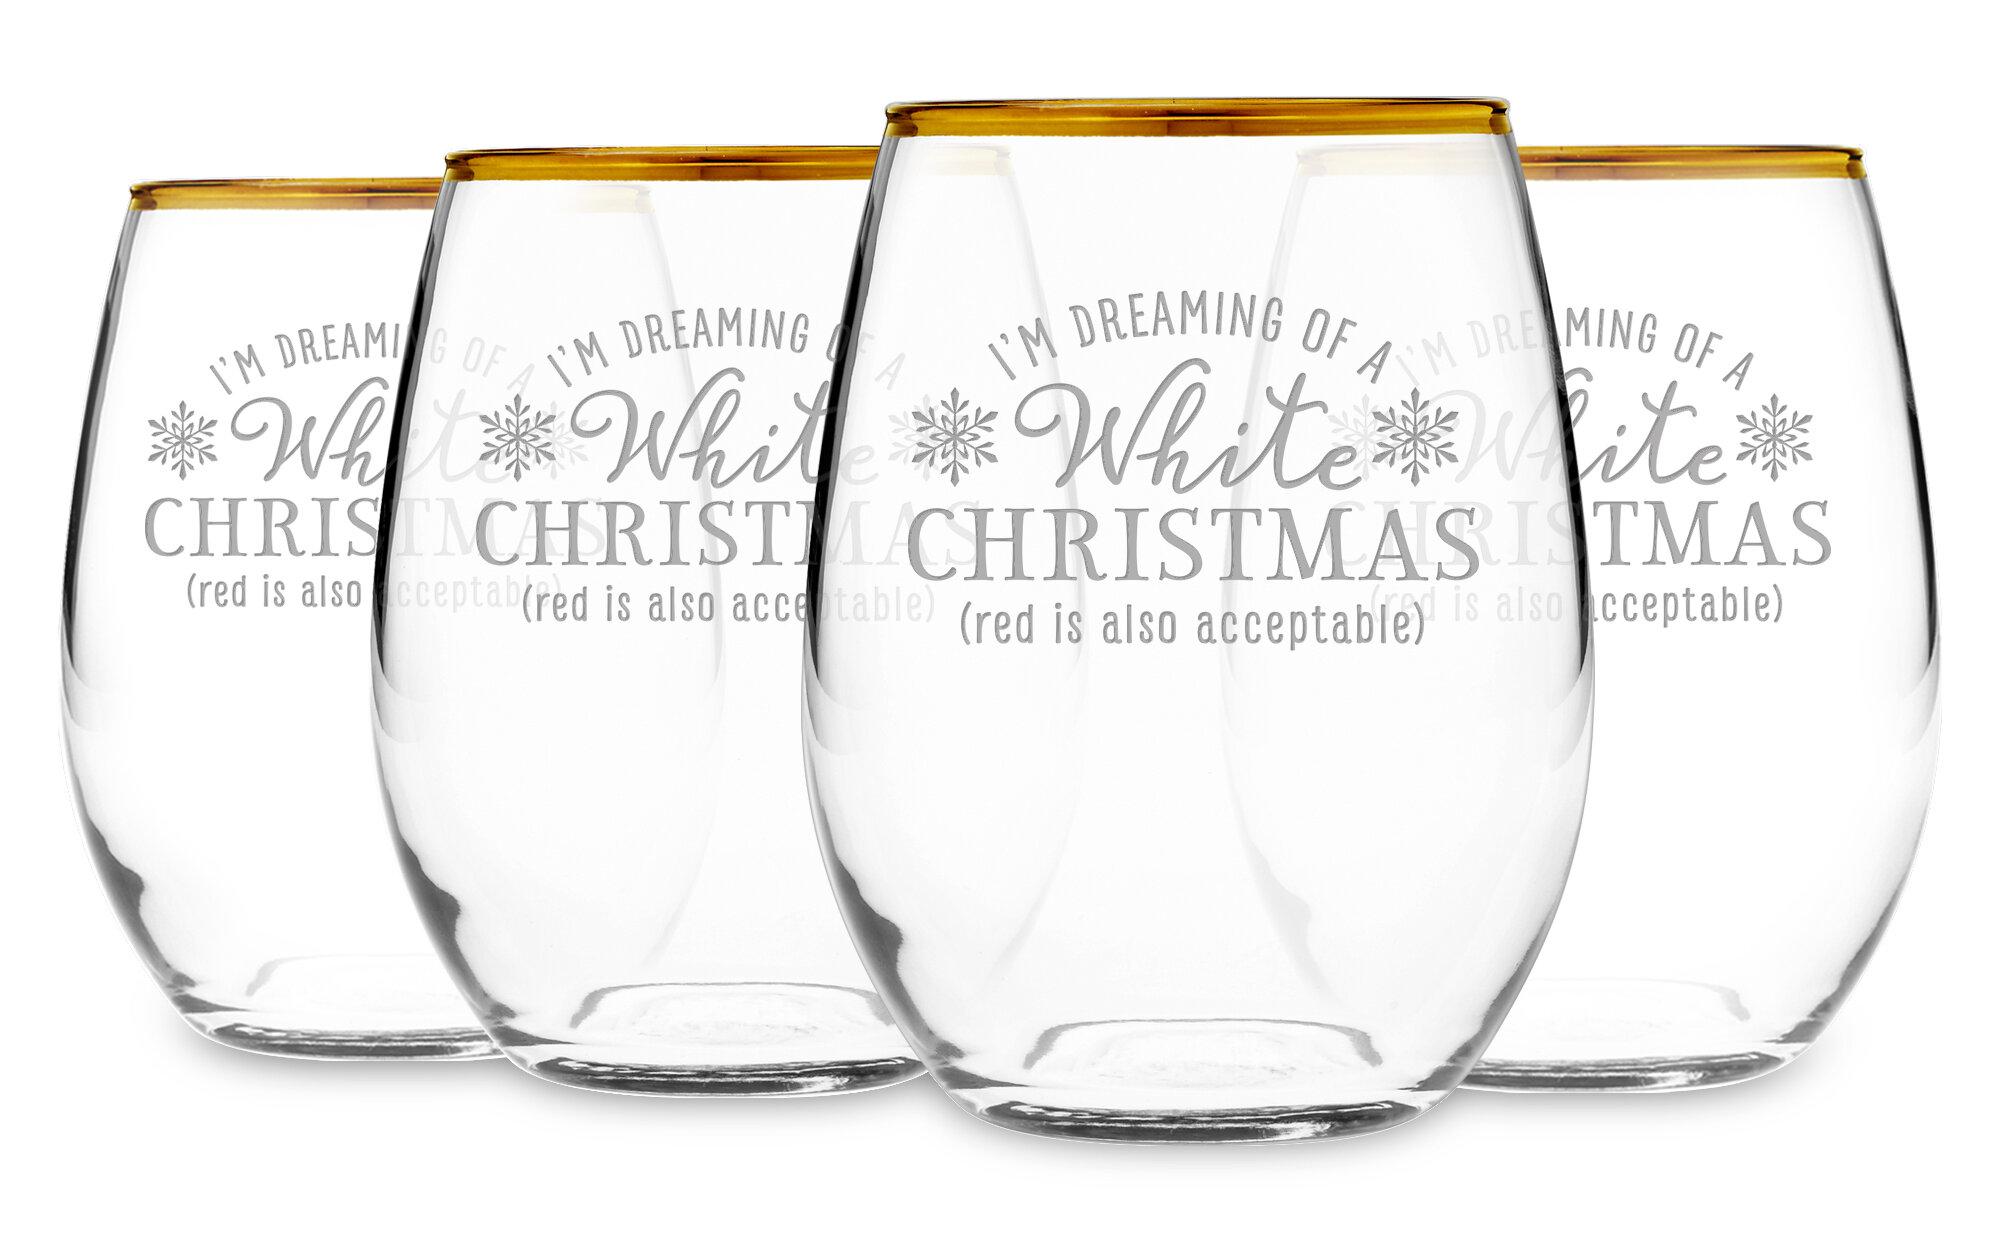 0f5ceda7b34 The Holiday Aisle Palmer White Christmas 21 oz. Stemless Wine Glass |  Wayfair